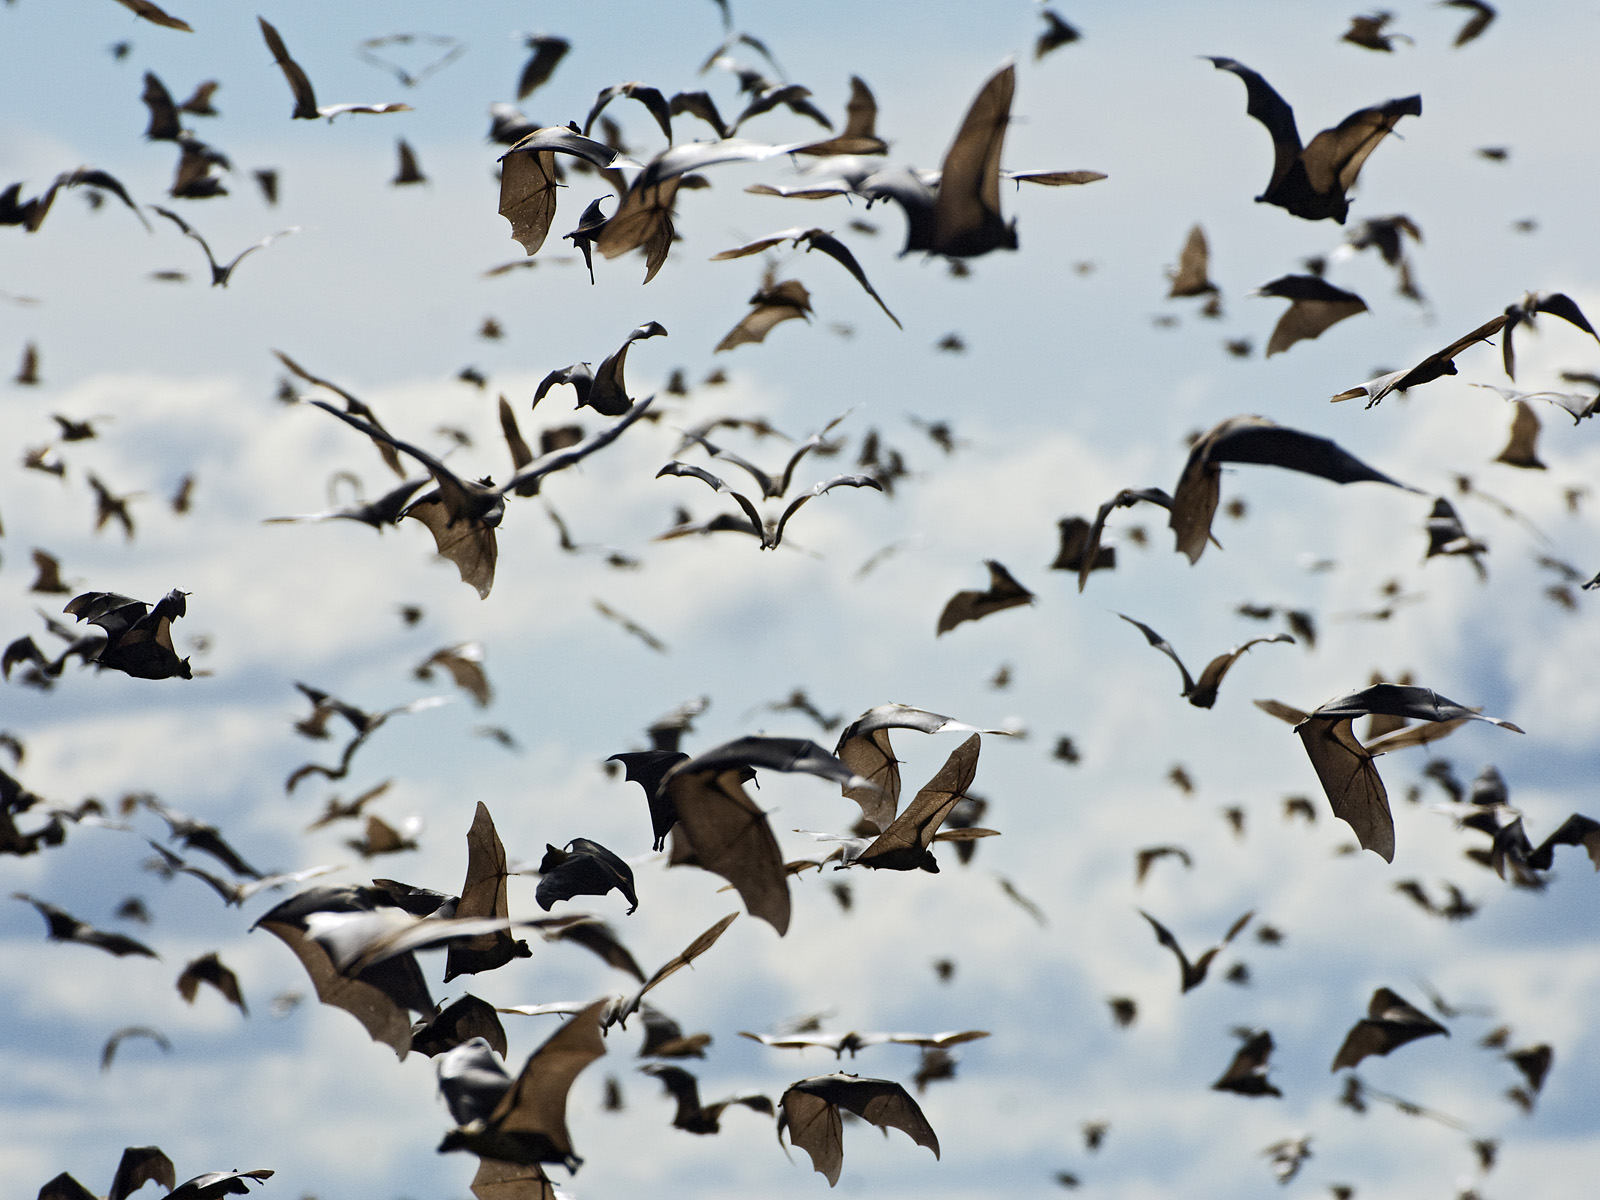 http://www.awf.org/sites/default/files/media/gallery/wildlife/Bat/straw-colored_fruit_bats__kasanka_national_park__zambia.jpg?itok=M70EX1xw